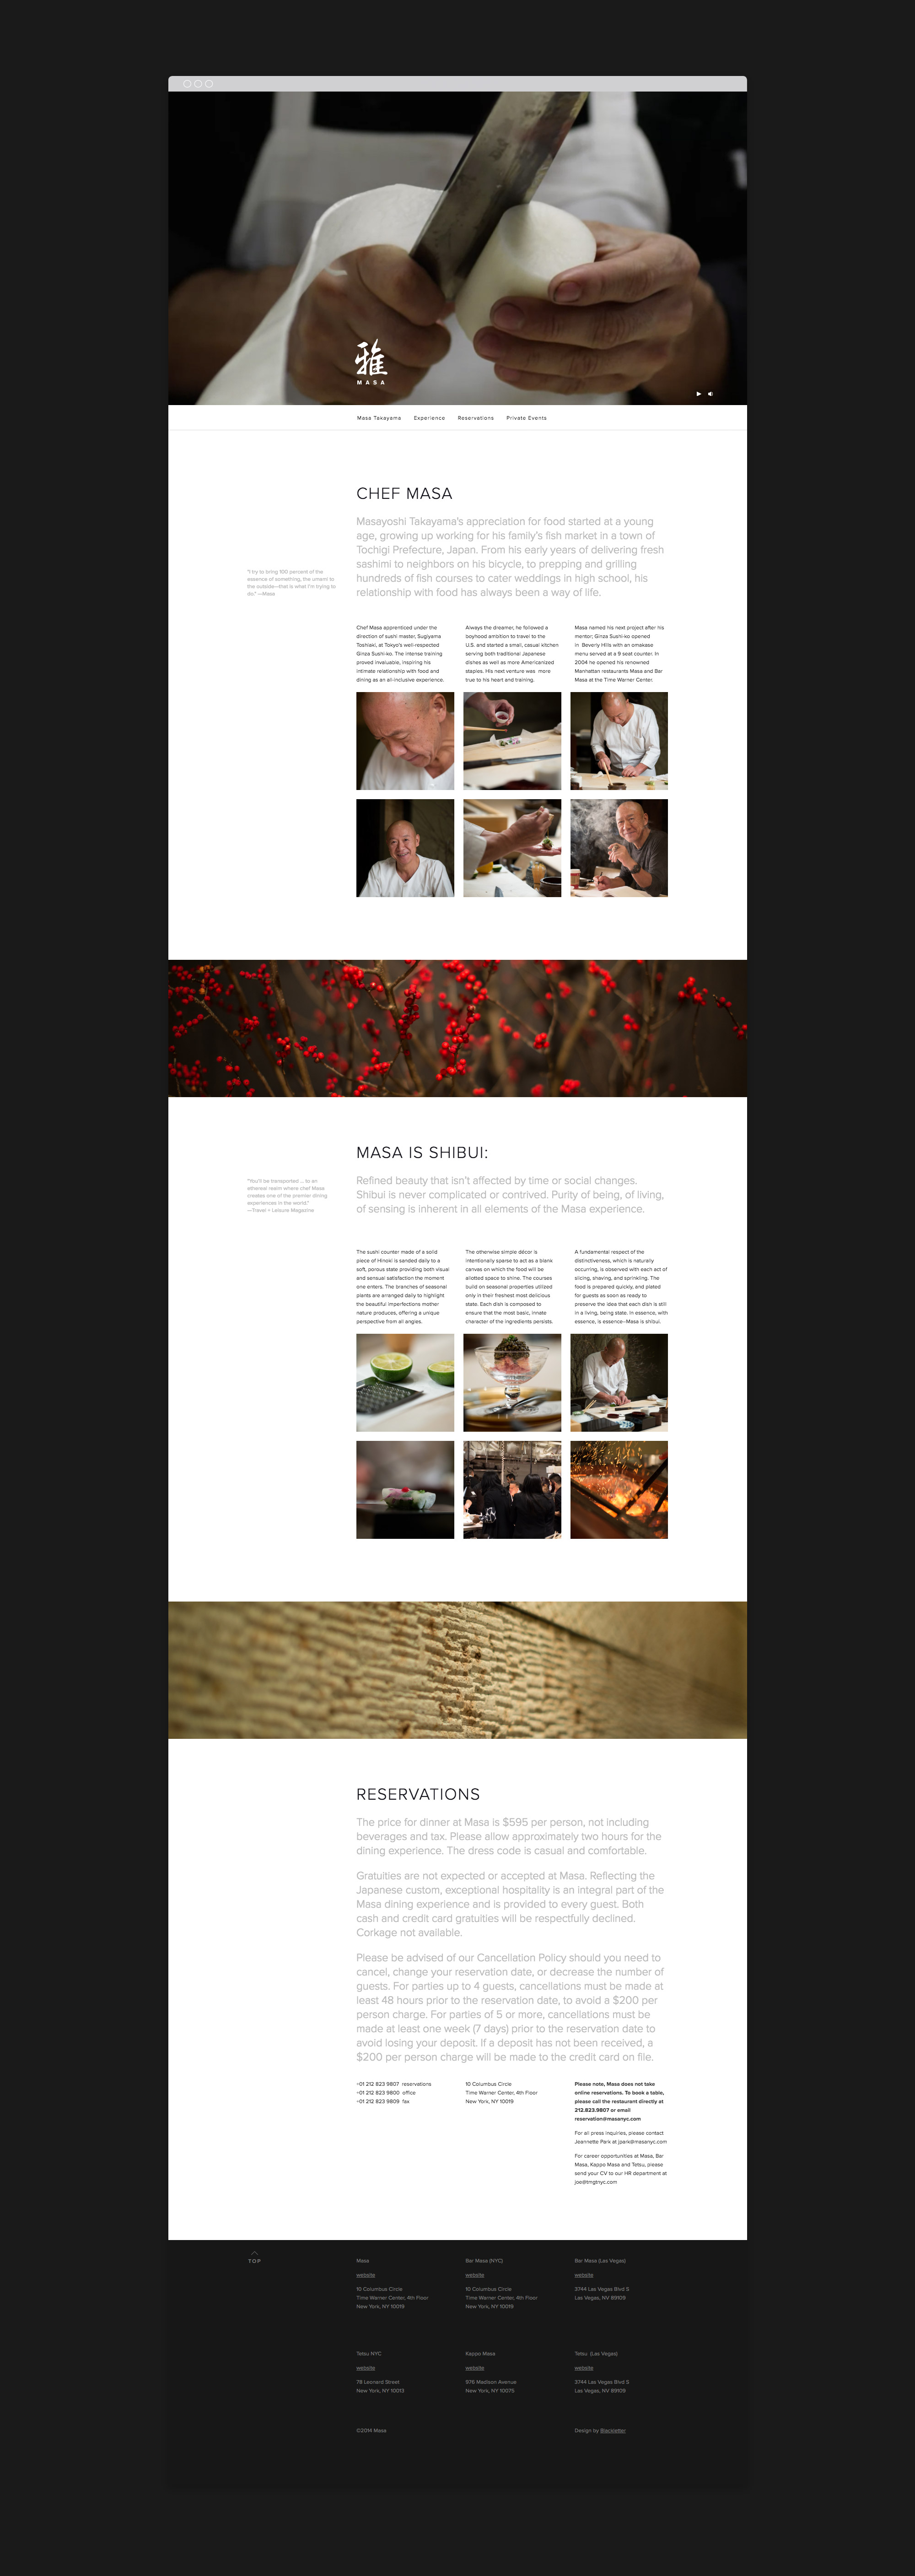 Masa NYC web design, content organization with photo gallery